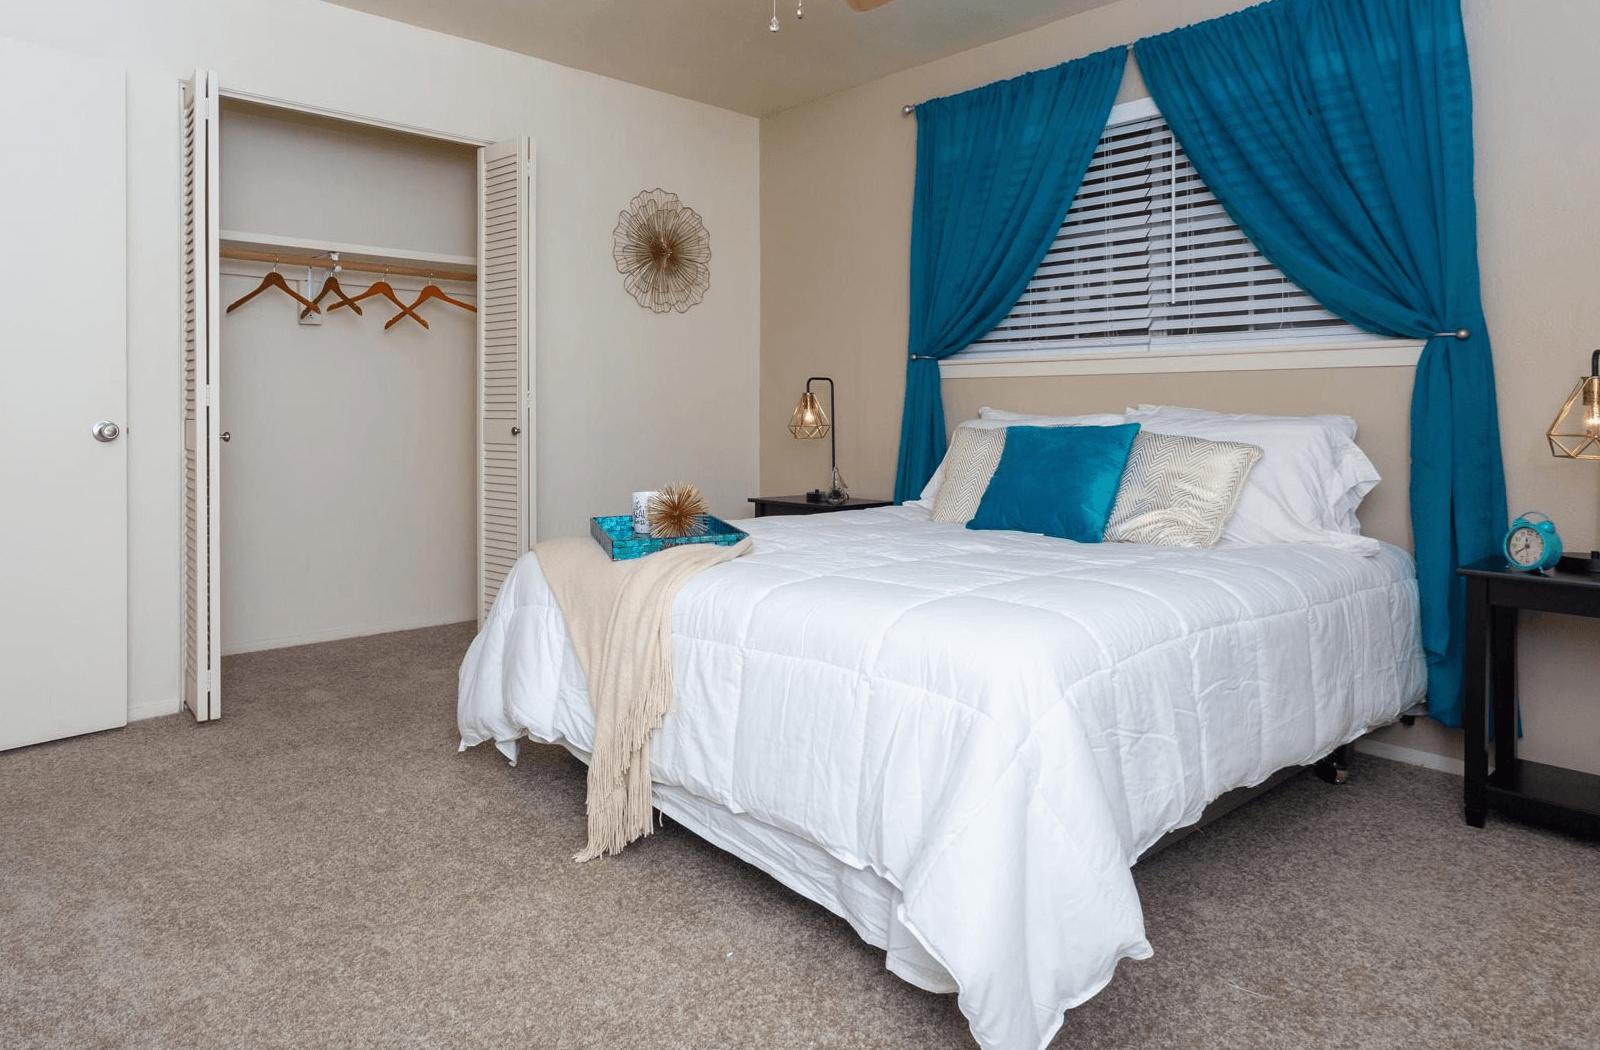 apartment in Wichita Falls, TX